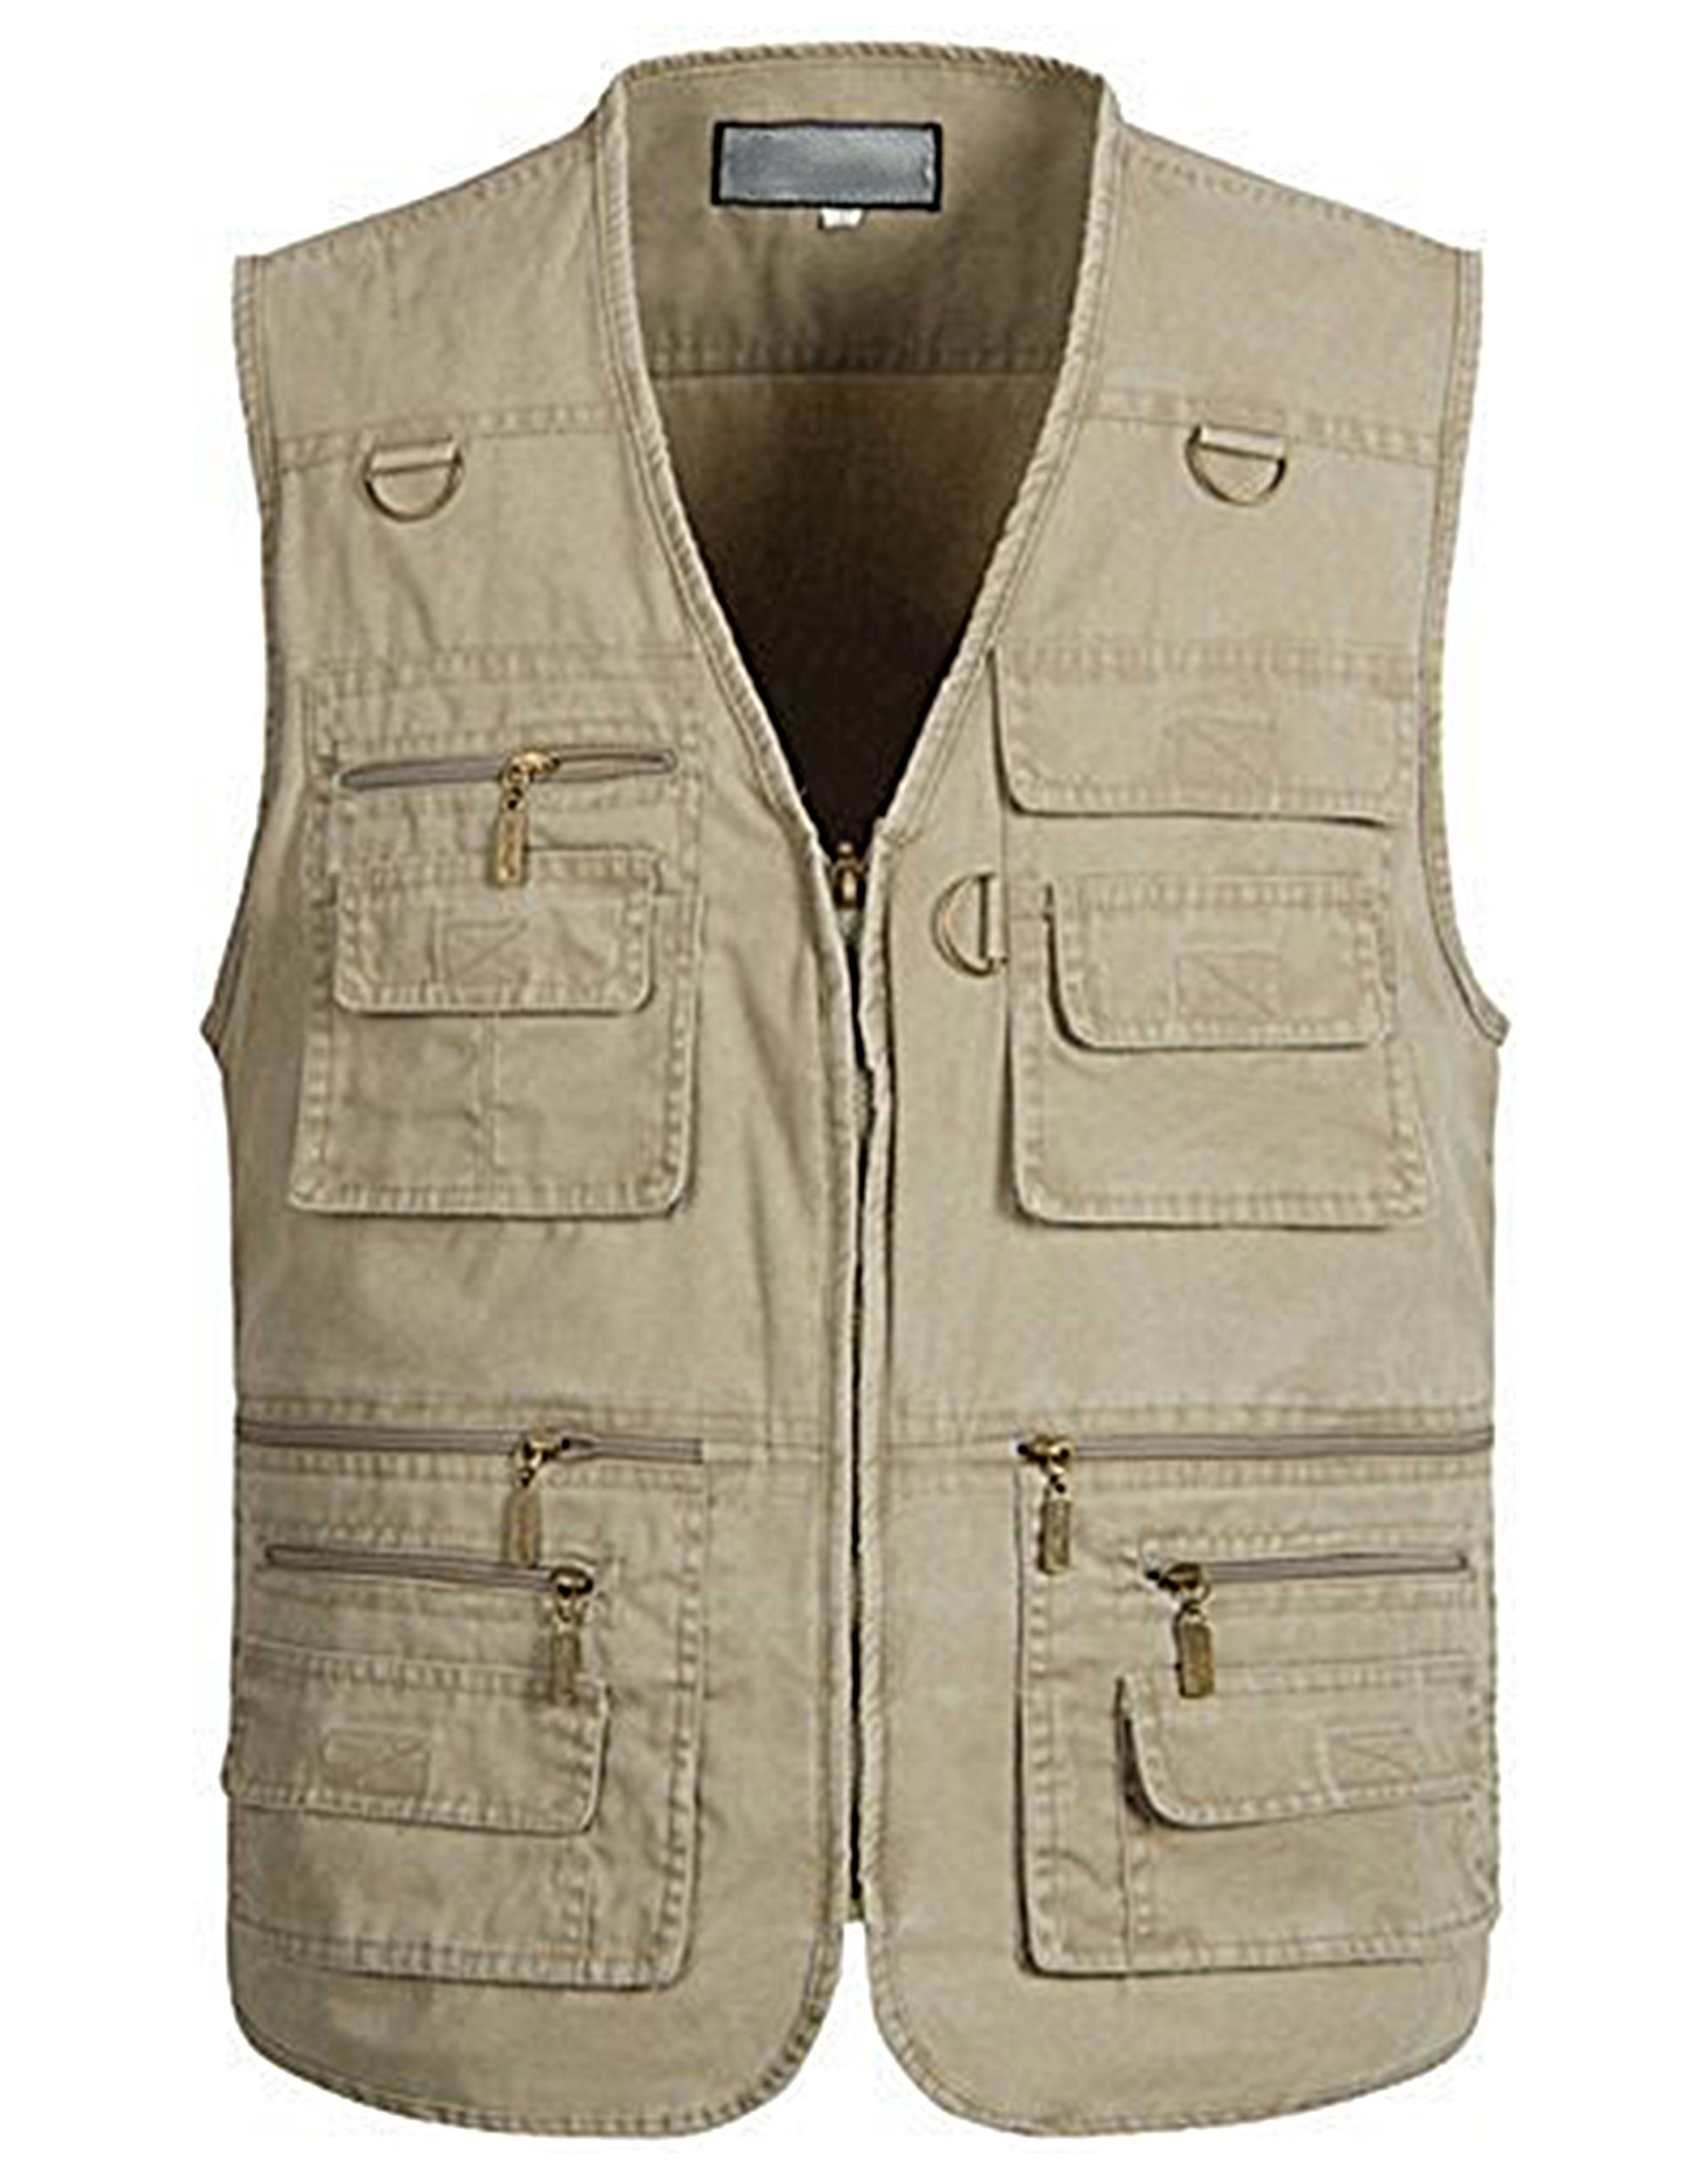 Alipolo Vest for Men Fishing Vest Outdoor Photo Travels Sports Vest Tops Khaki Large by Alipolo